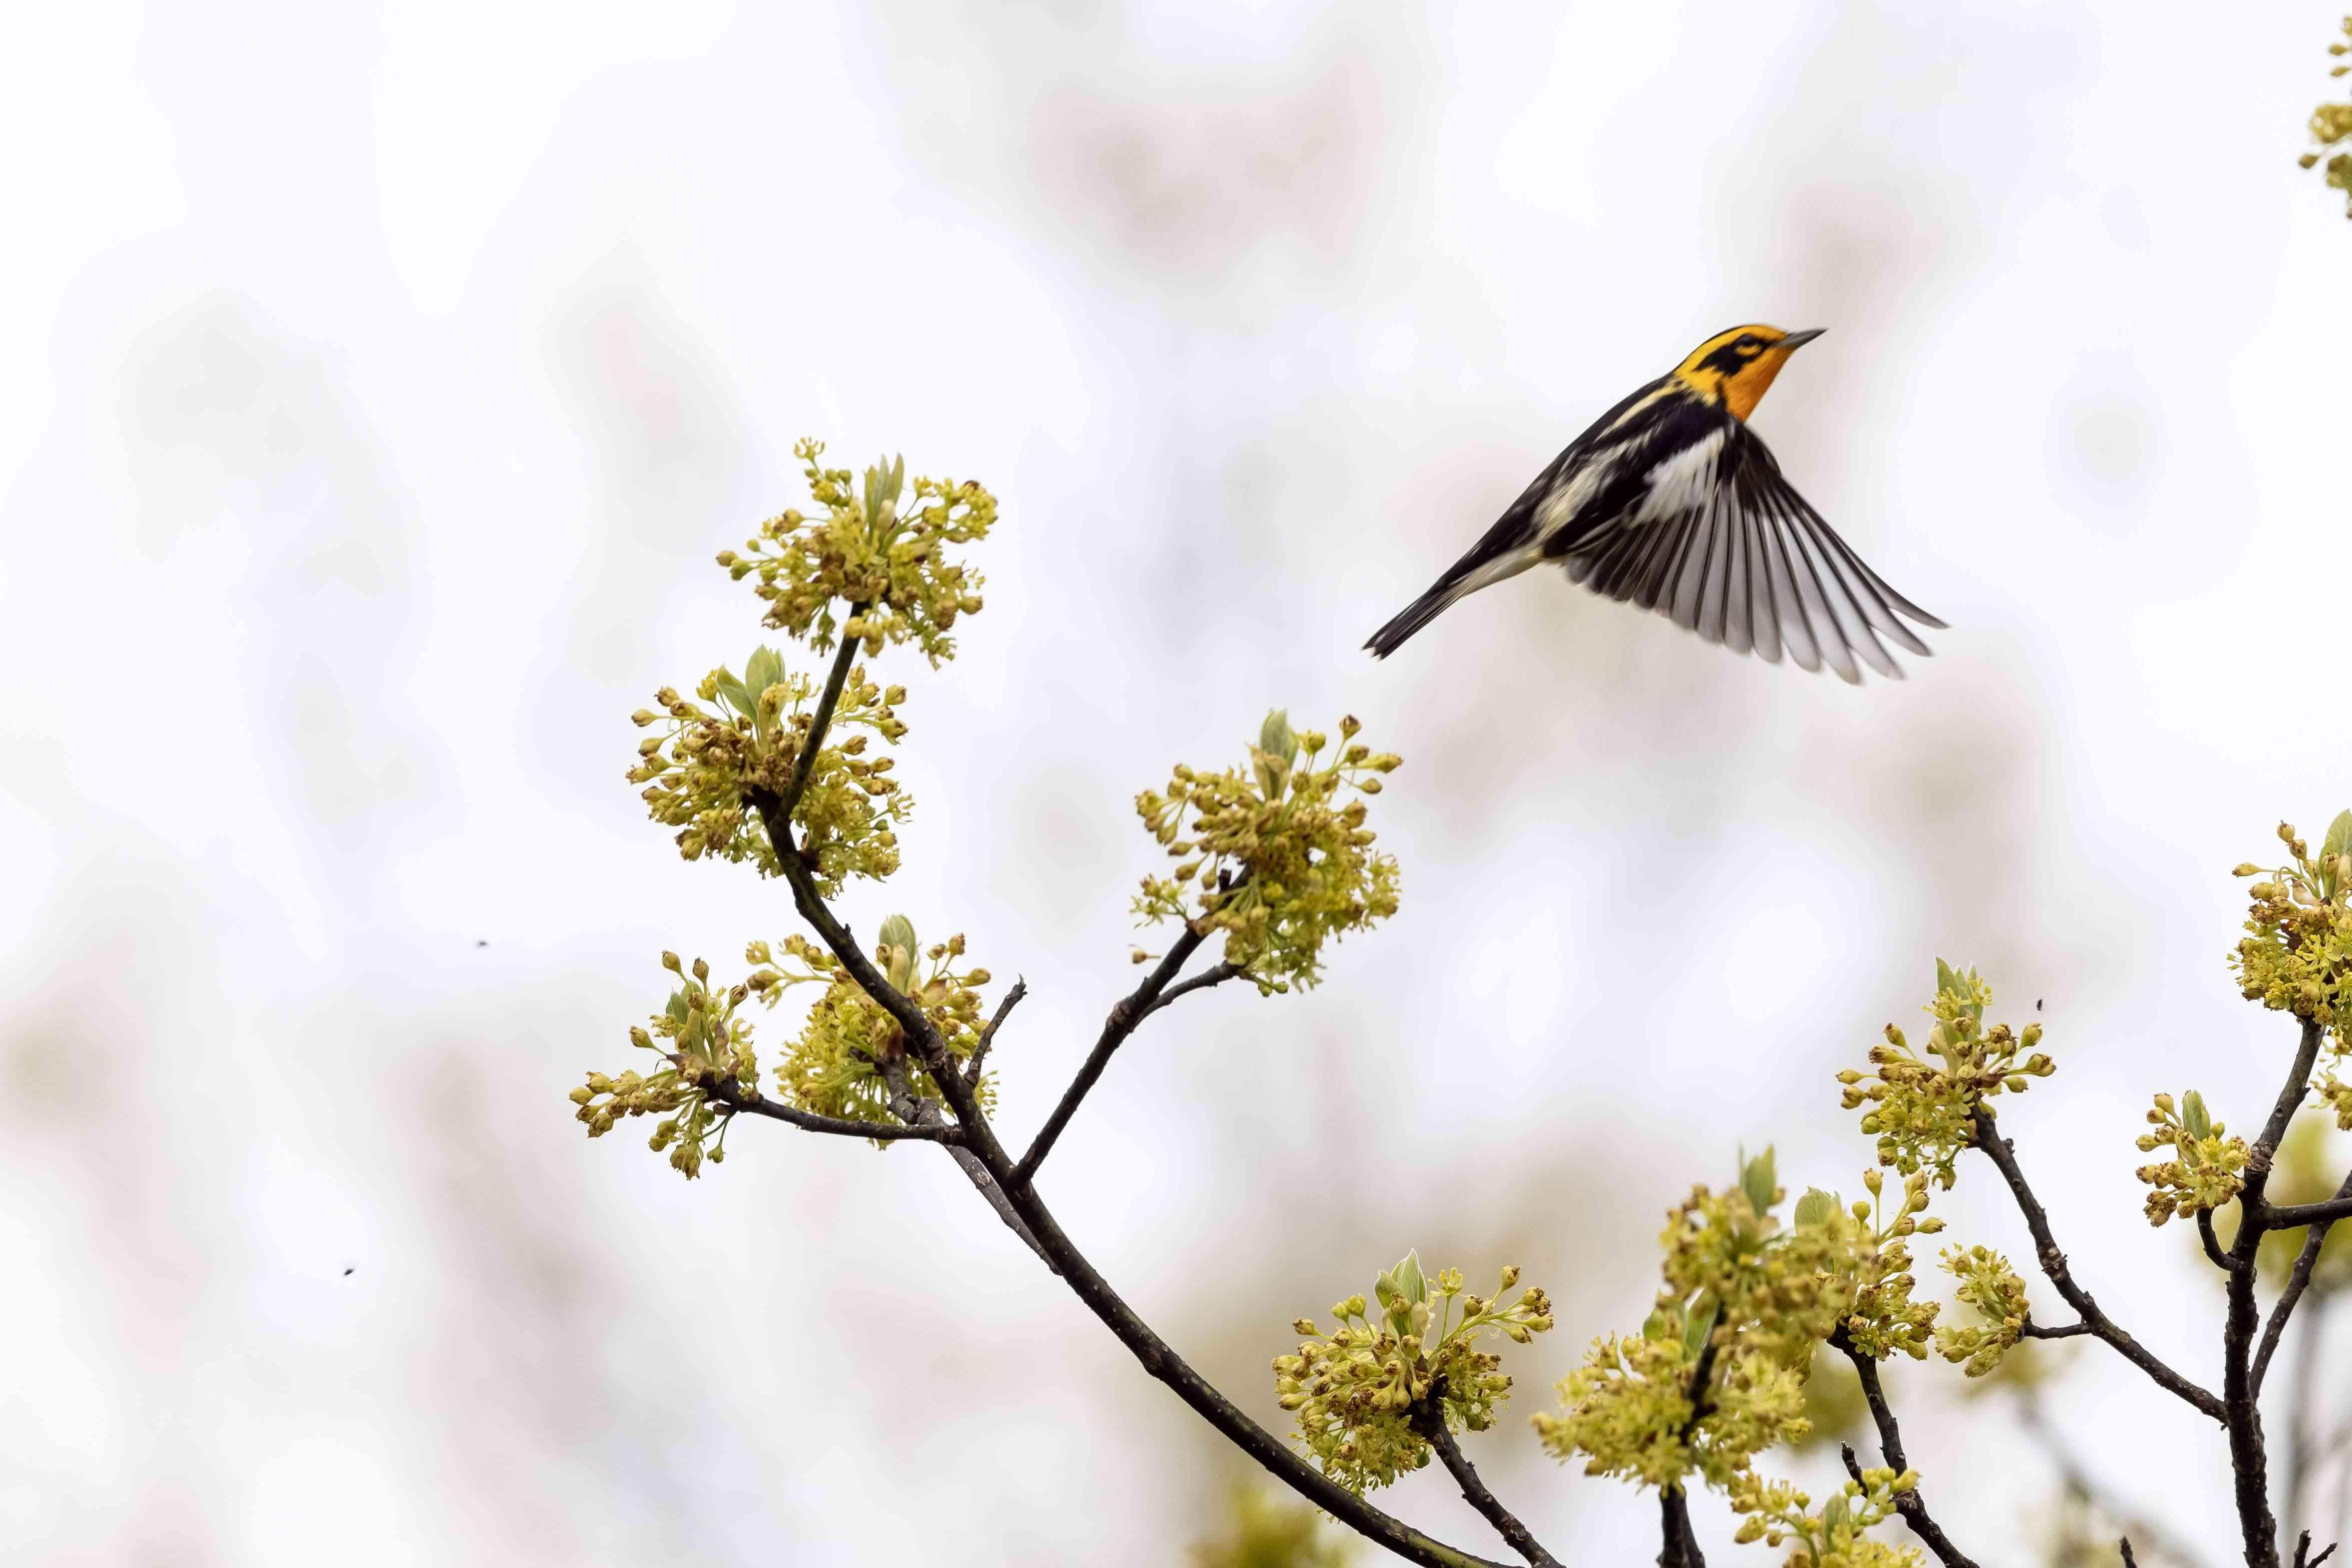 Blackburnian warbler flying from a tree